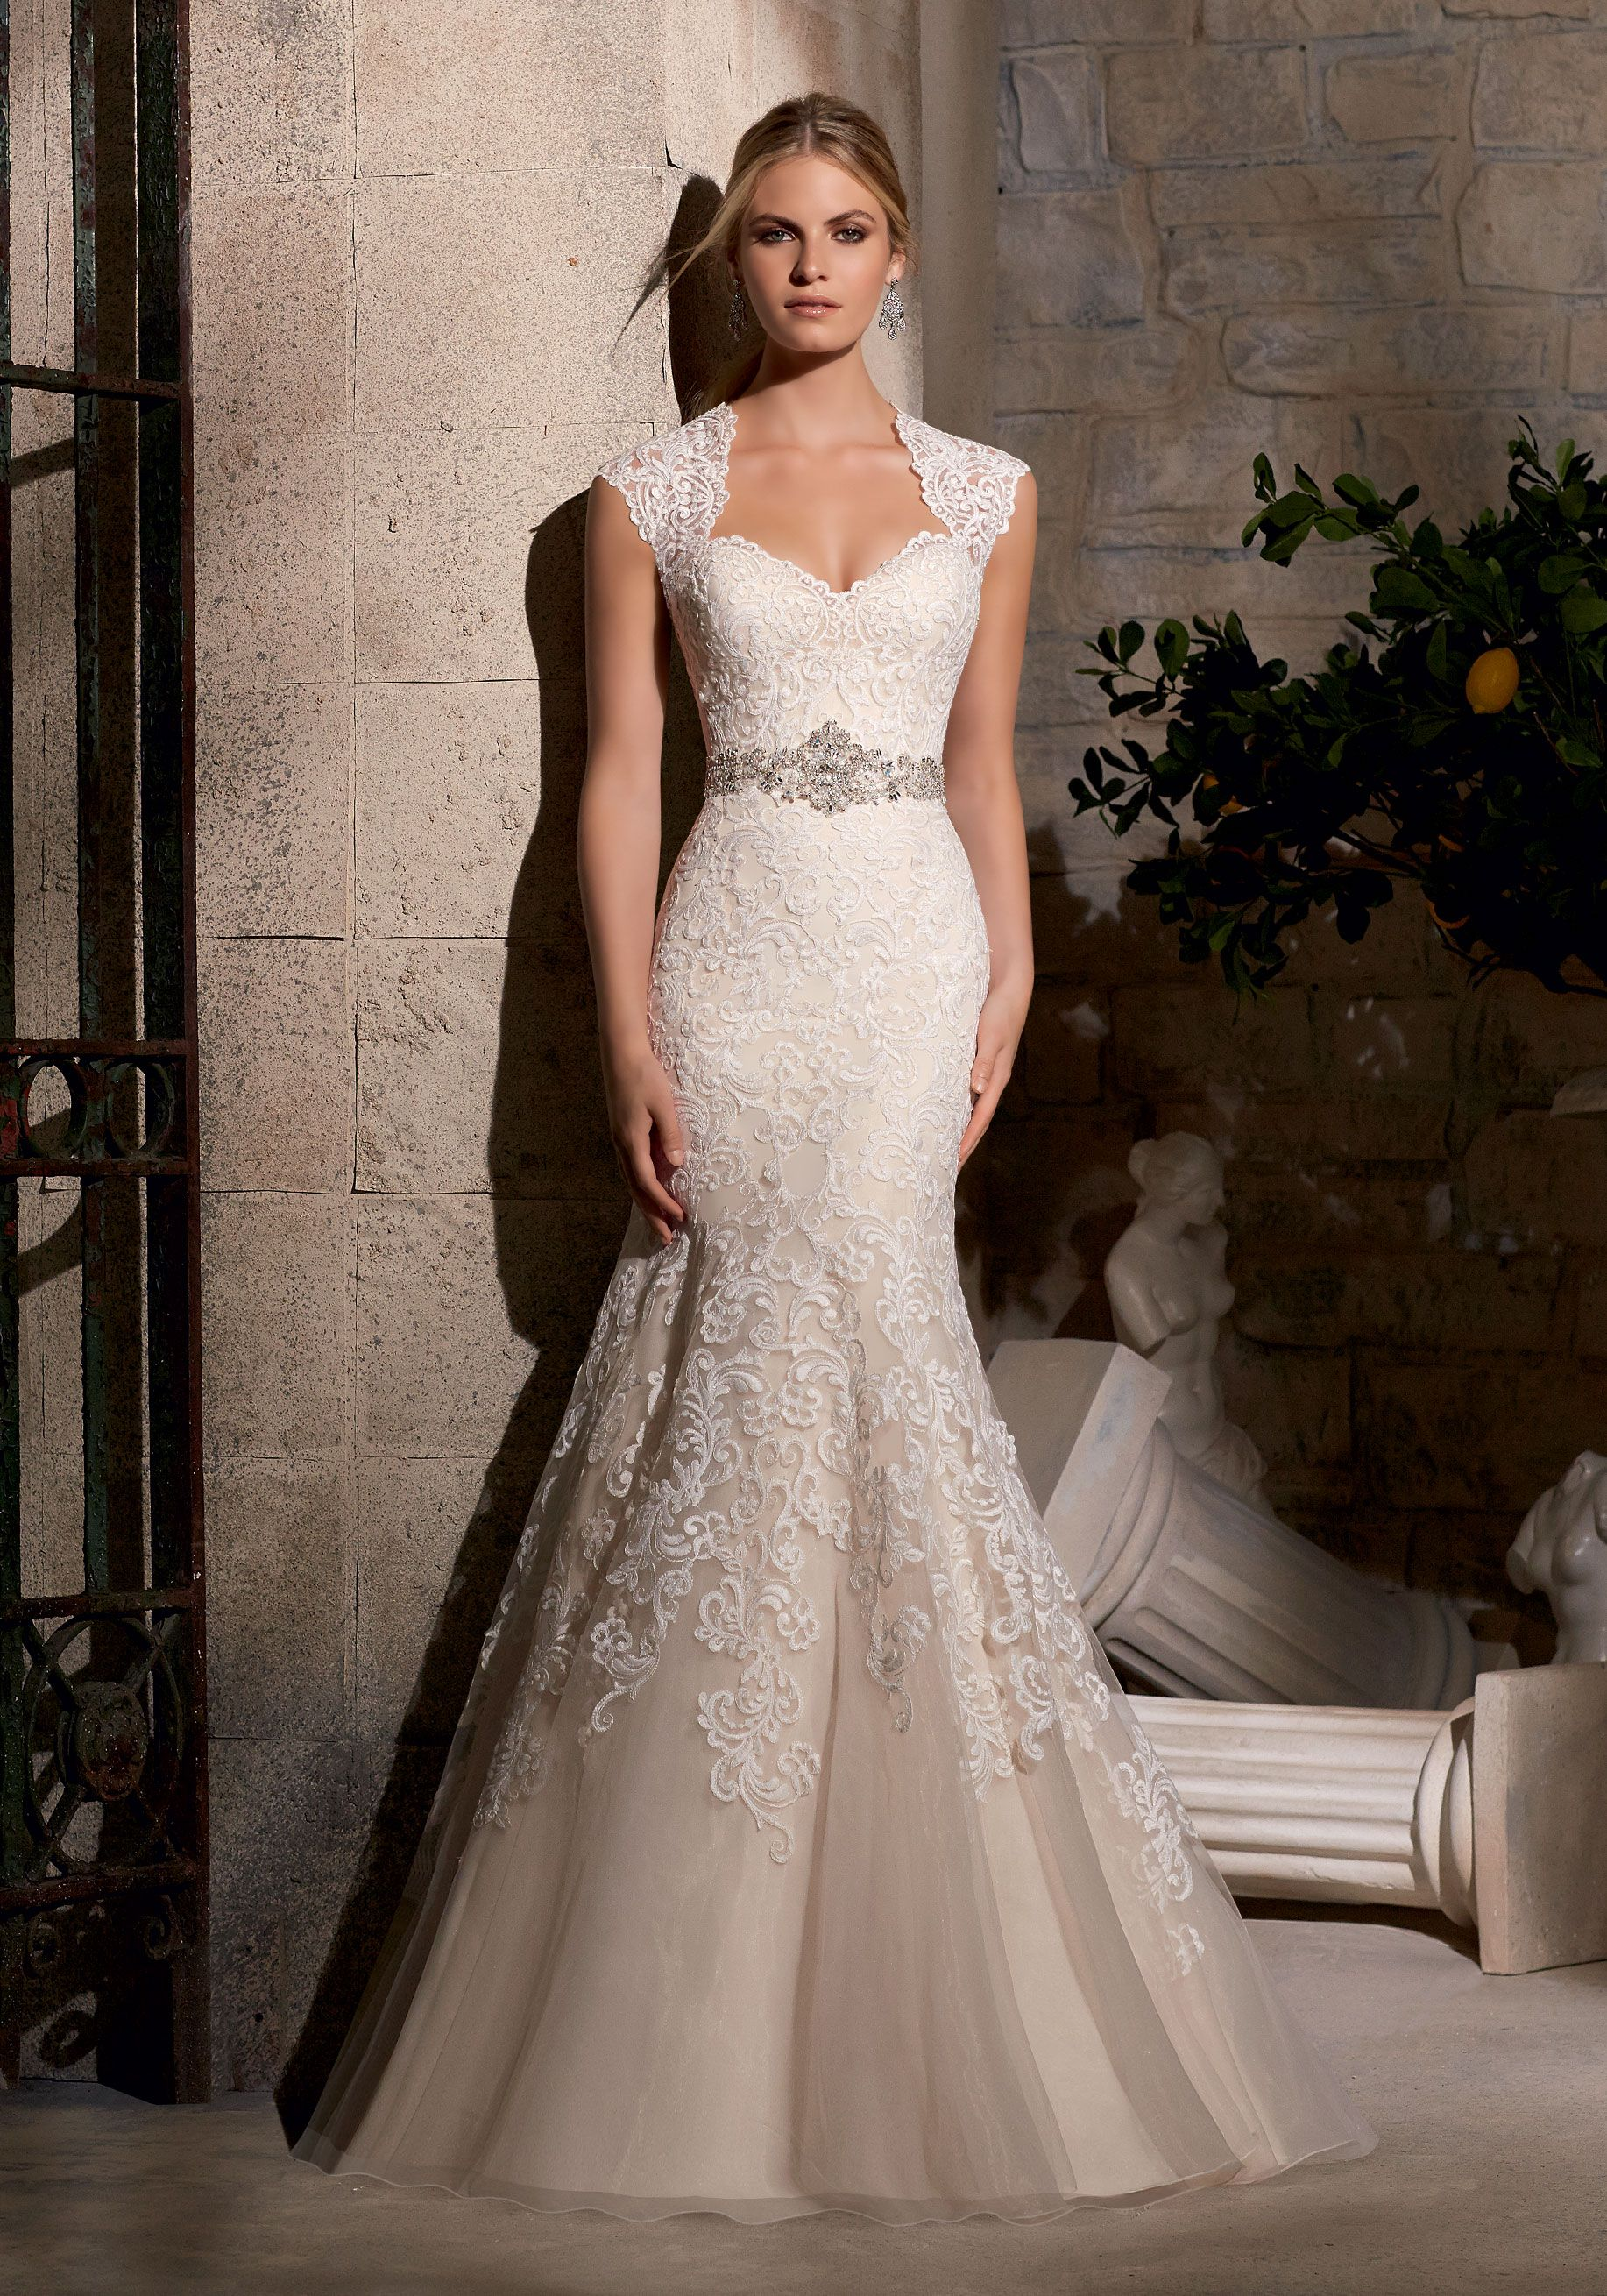 Beaded sheath wedding dress  Ornate embroidery adorns this Bridal Dress Diamante beading creates